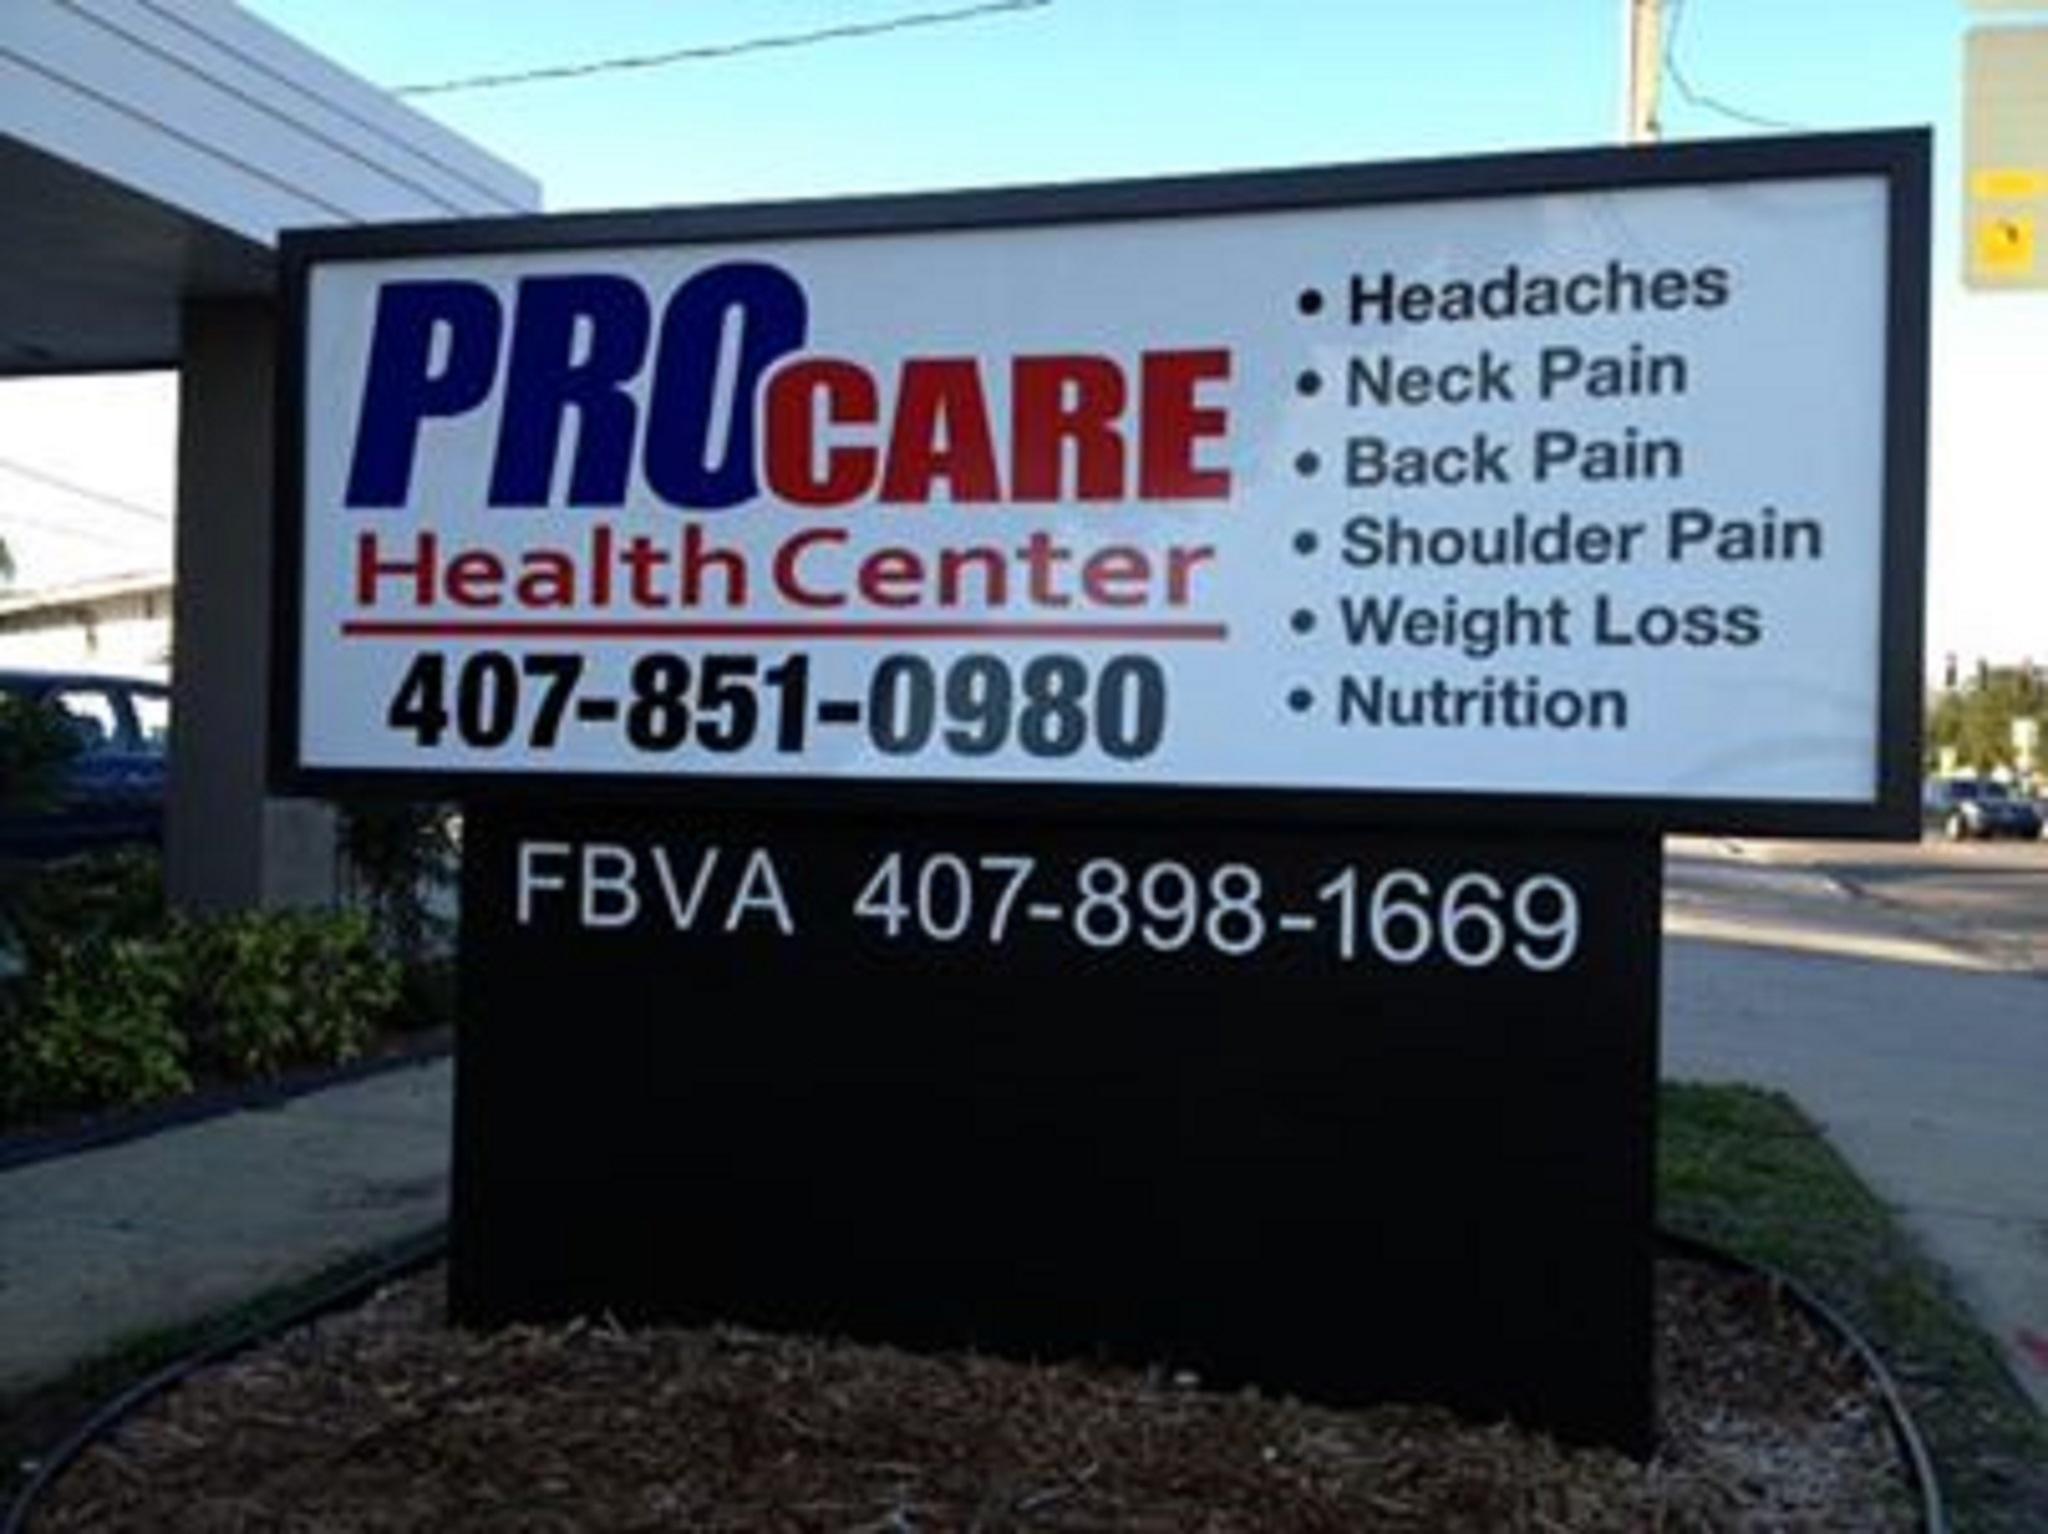 Pro Care Health Center image 1